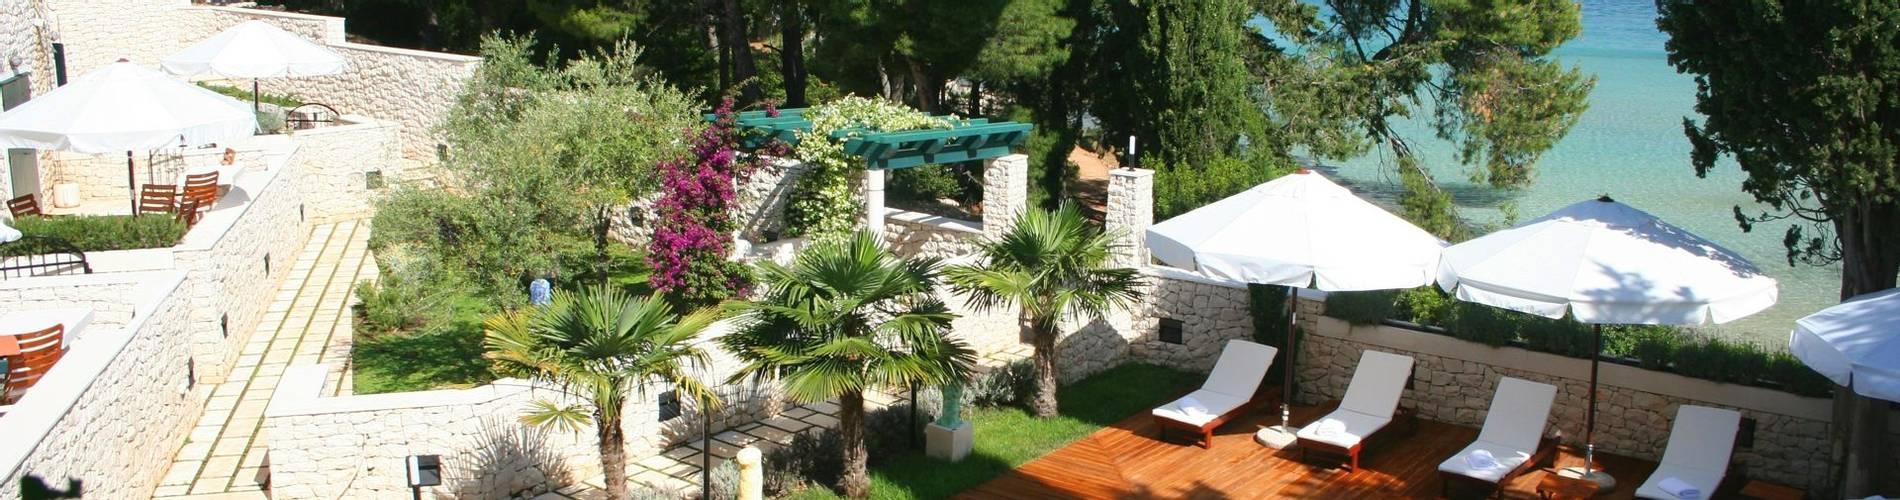 Villa pool2.jpg